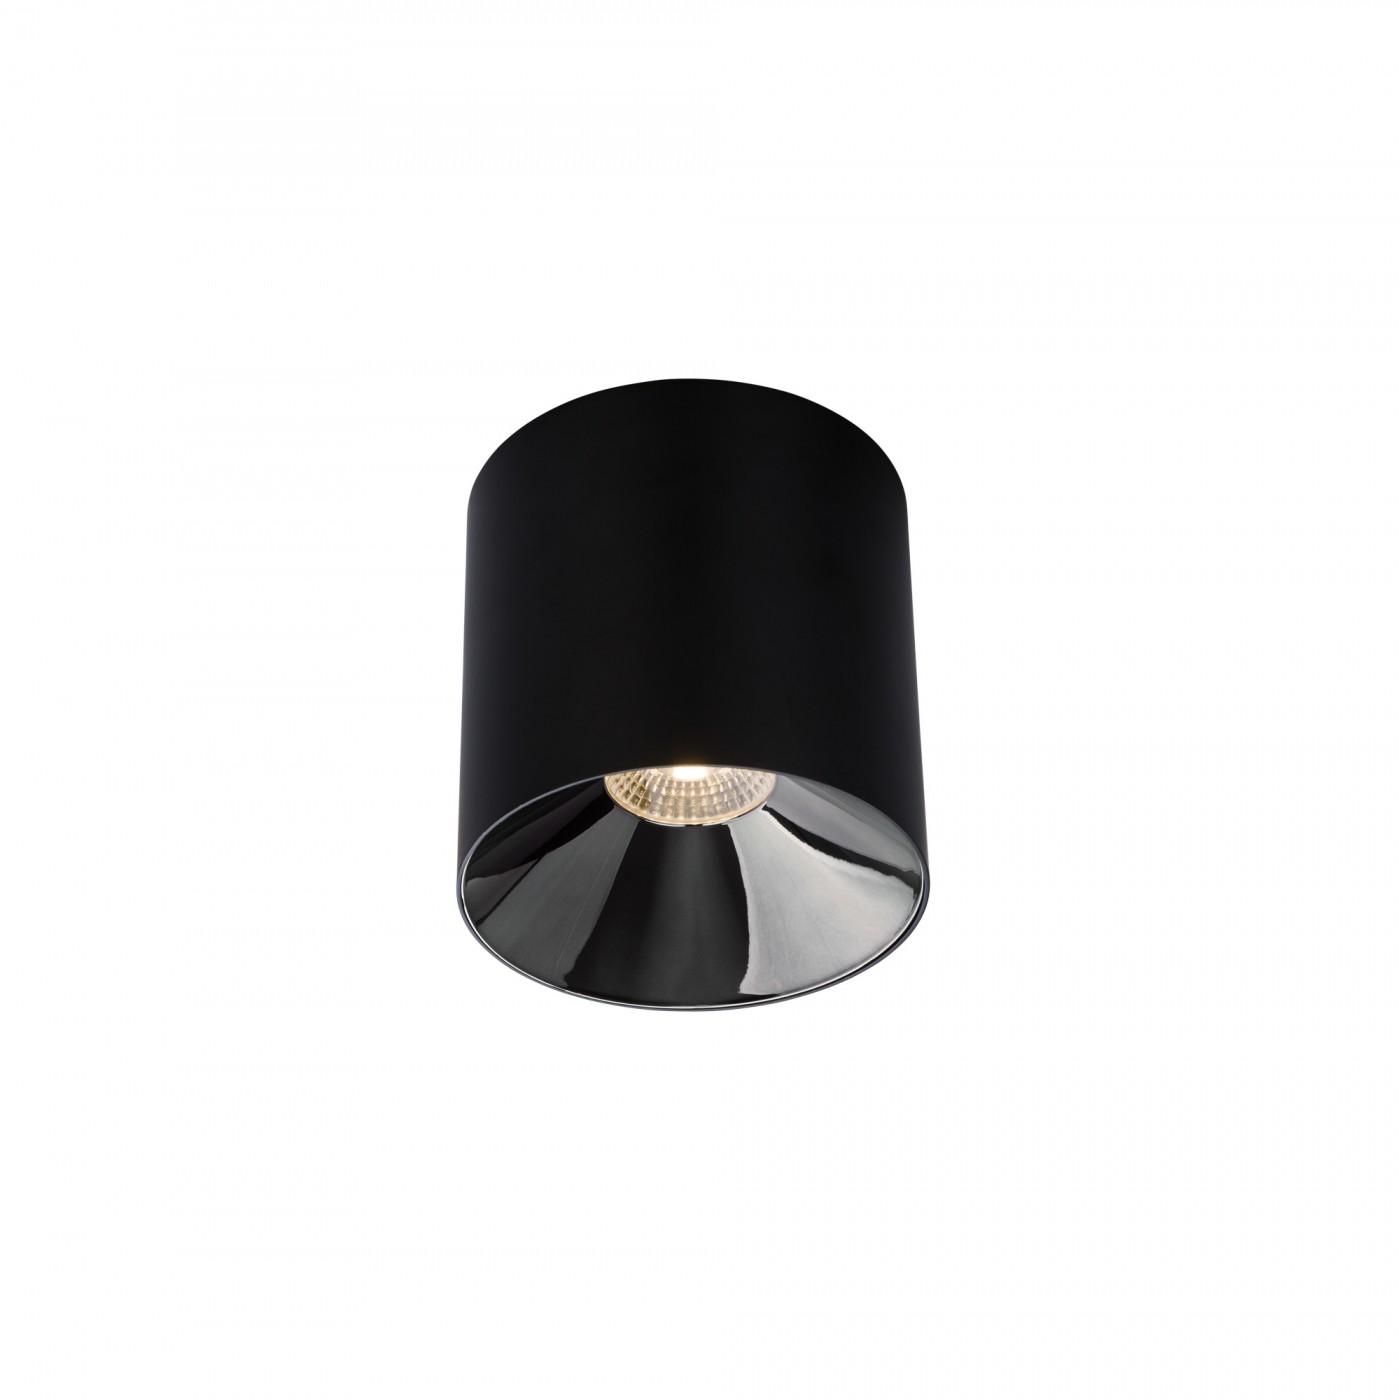 CL IOS LED 20W 3000K black 8742 Nowodvorski Lighting